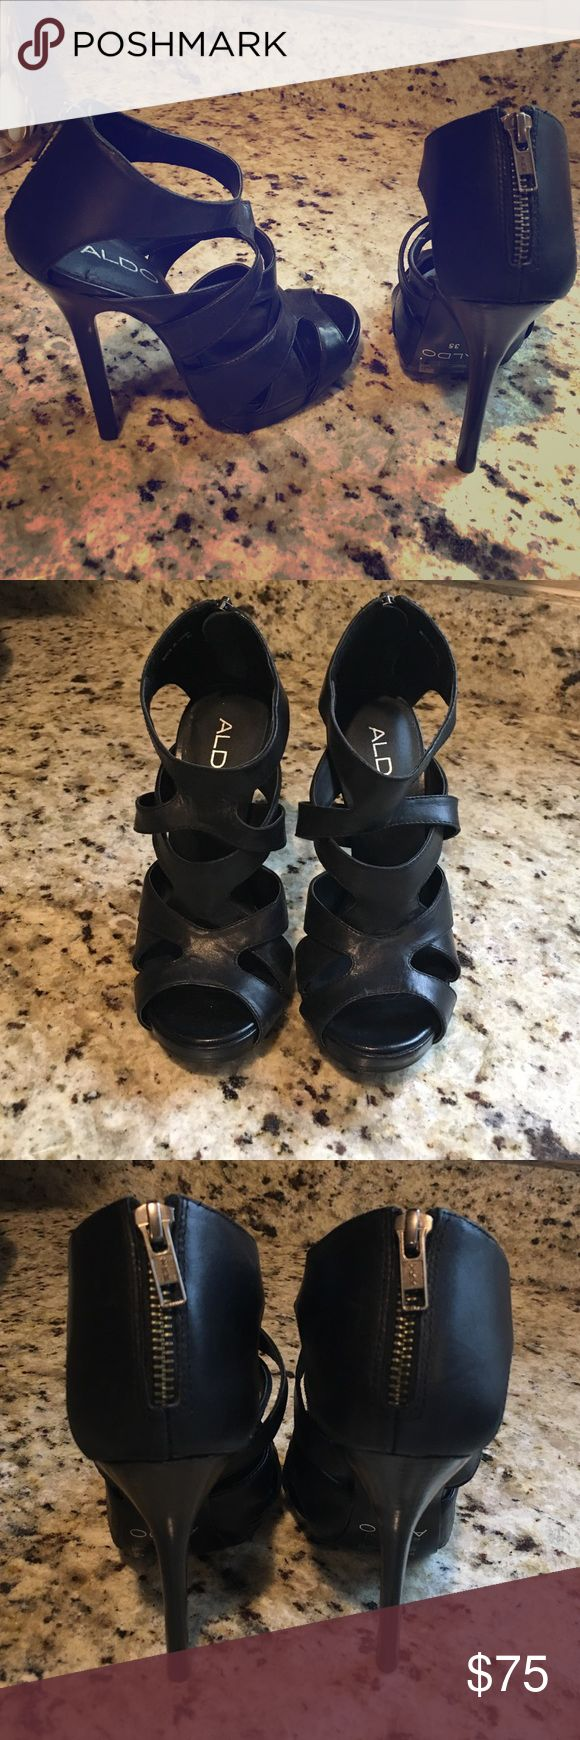 Brand New Aldo Heels Never worn. No box. Cute zipper detail on back of shoe. Aldo Shoes Heels